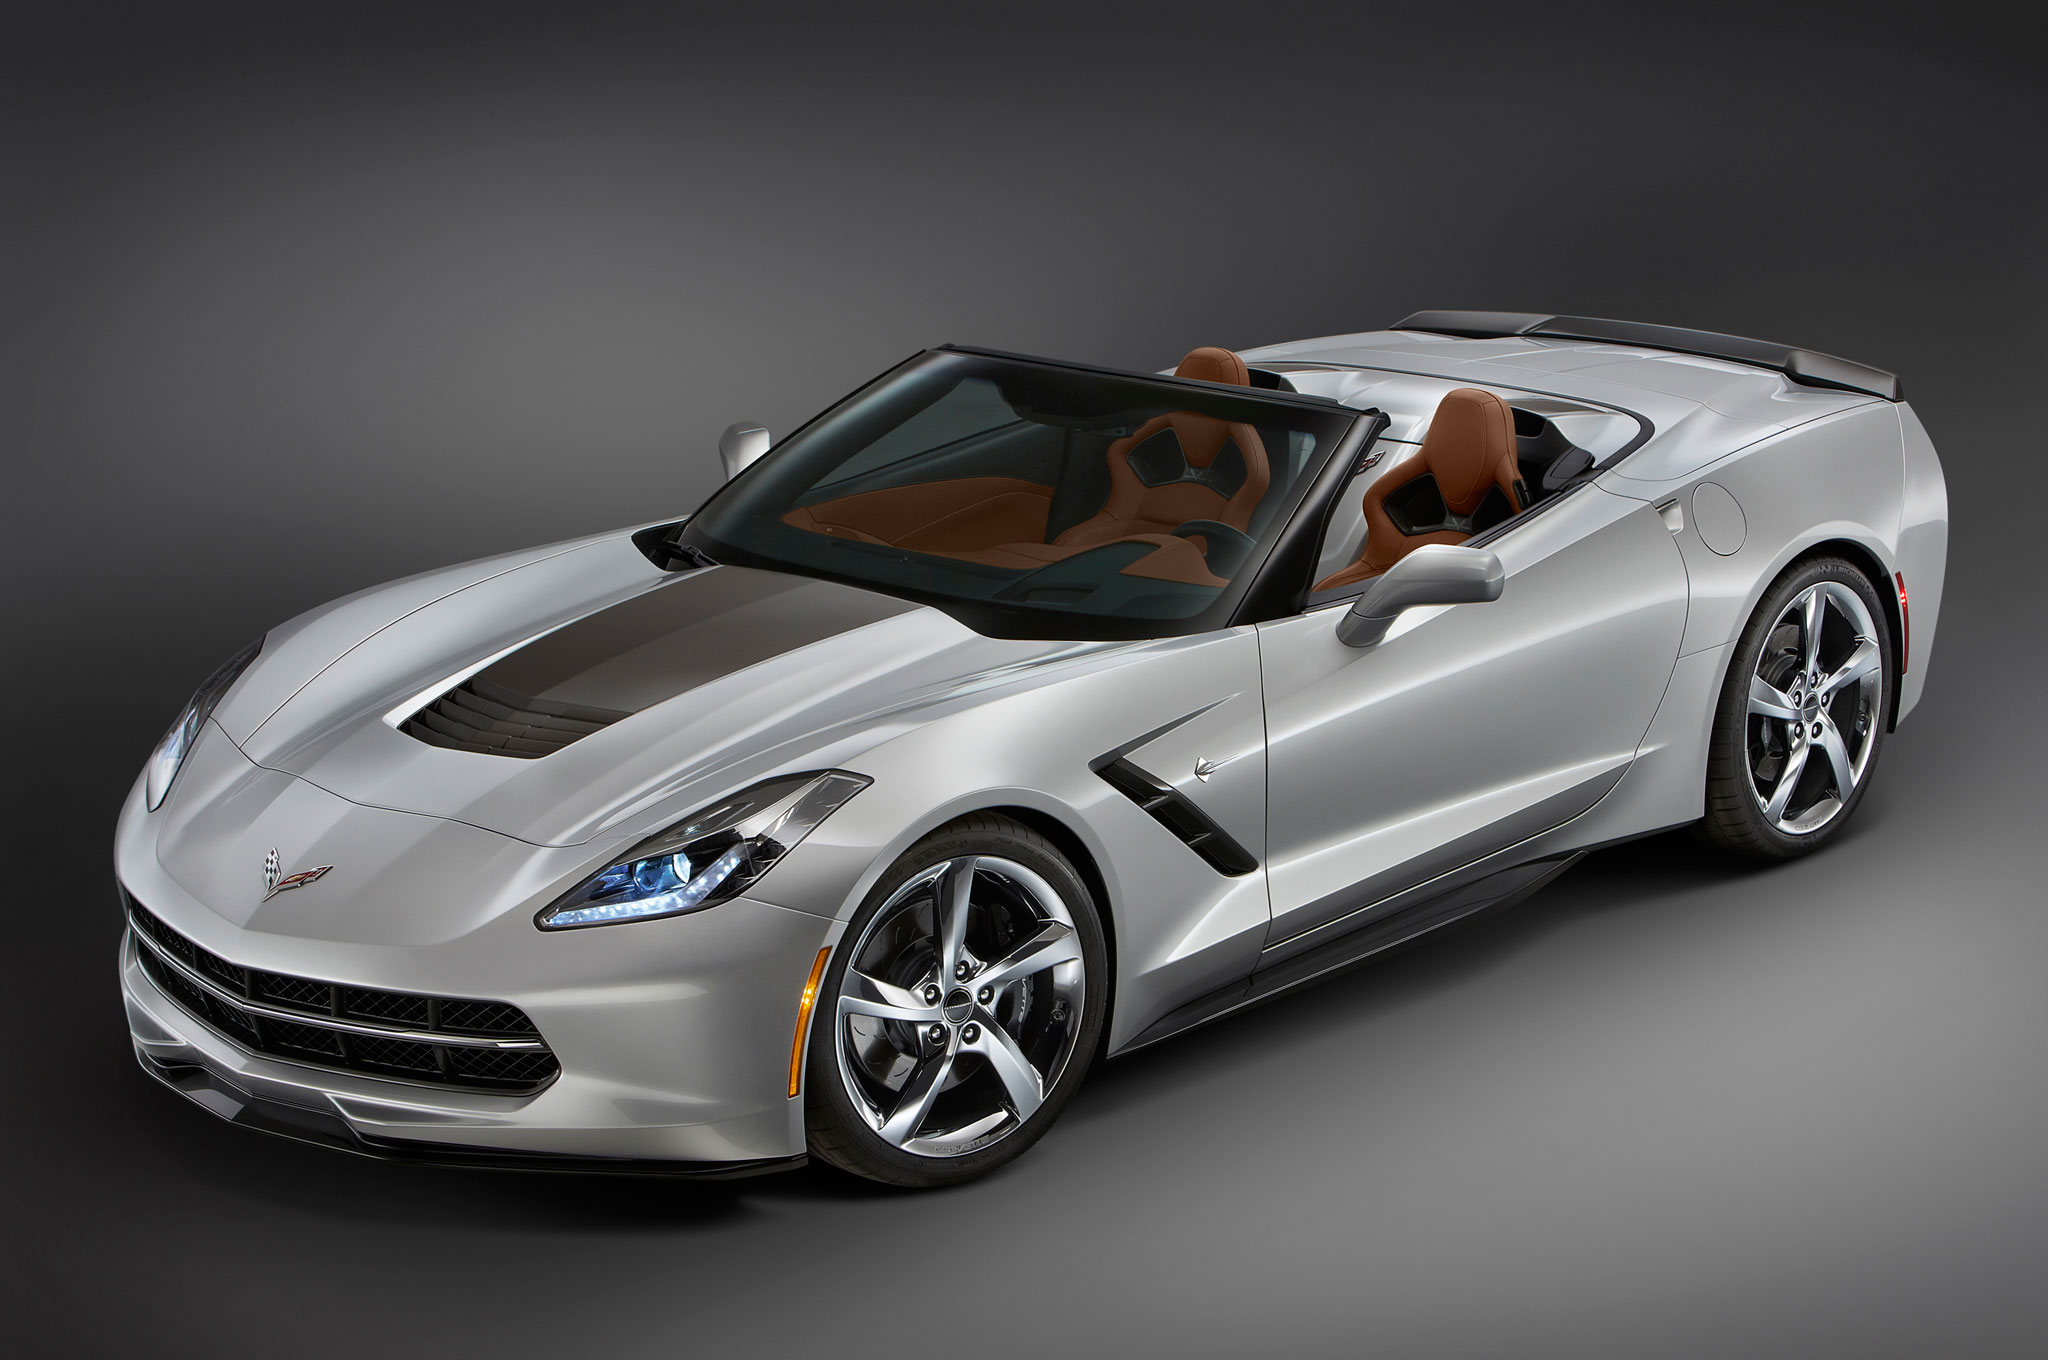 2015 Chevrolet Corvette Stingray Atlantic Convertible